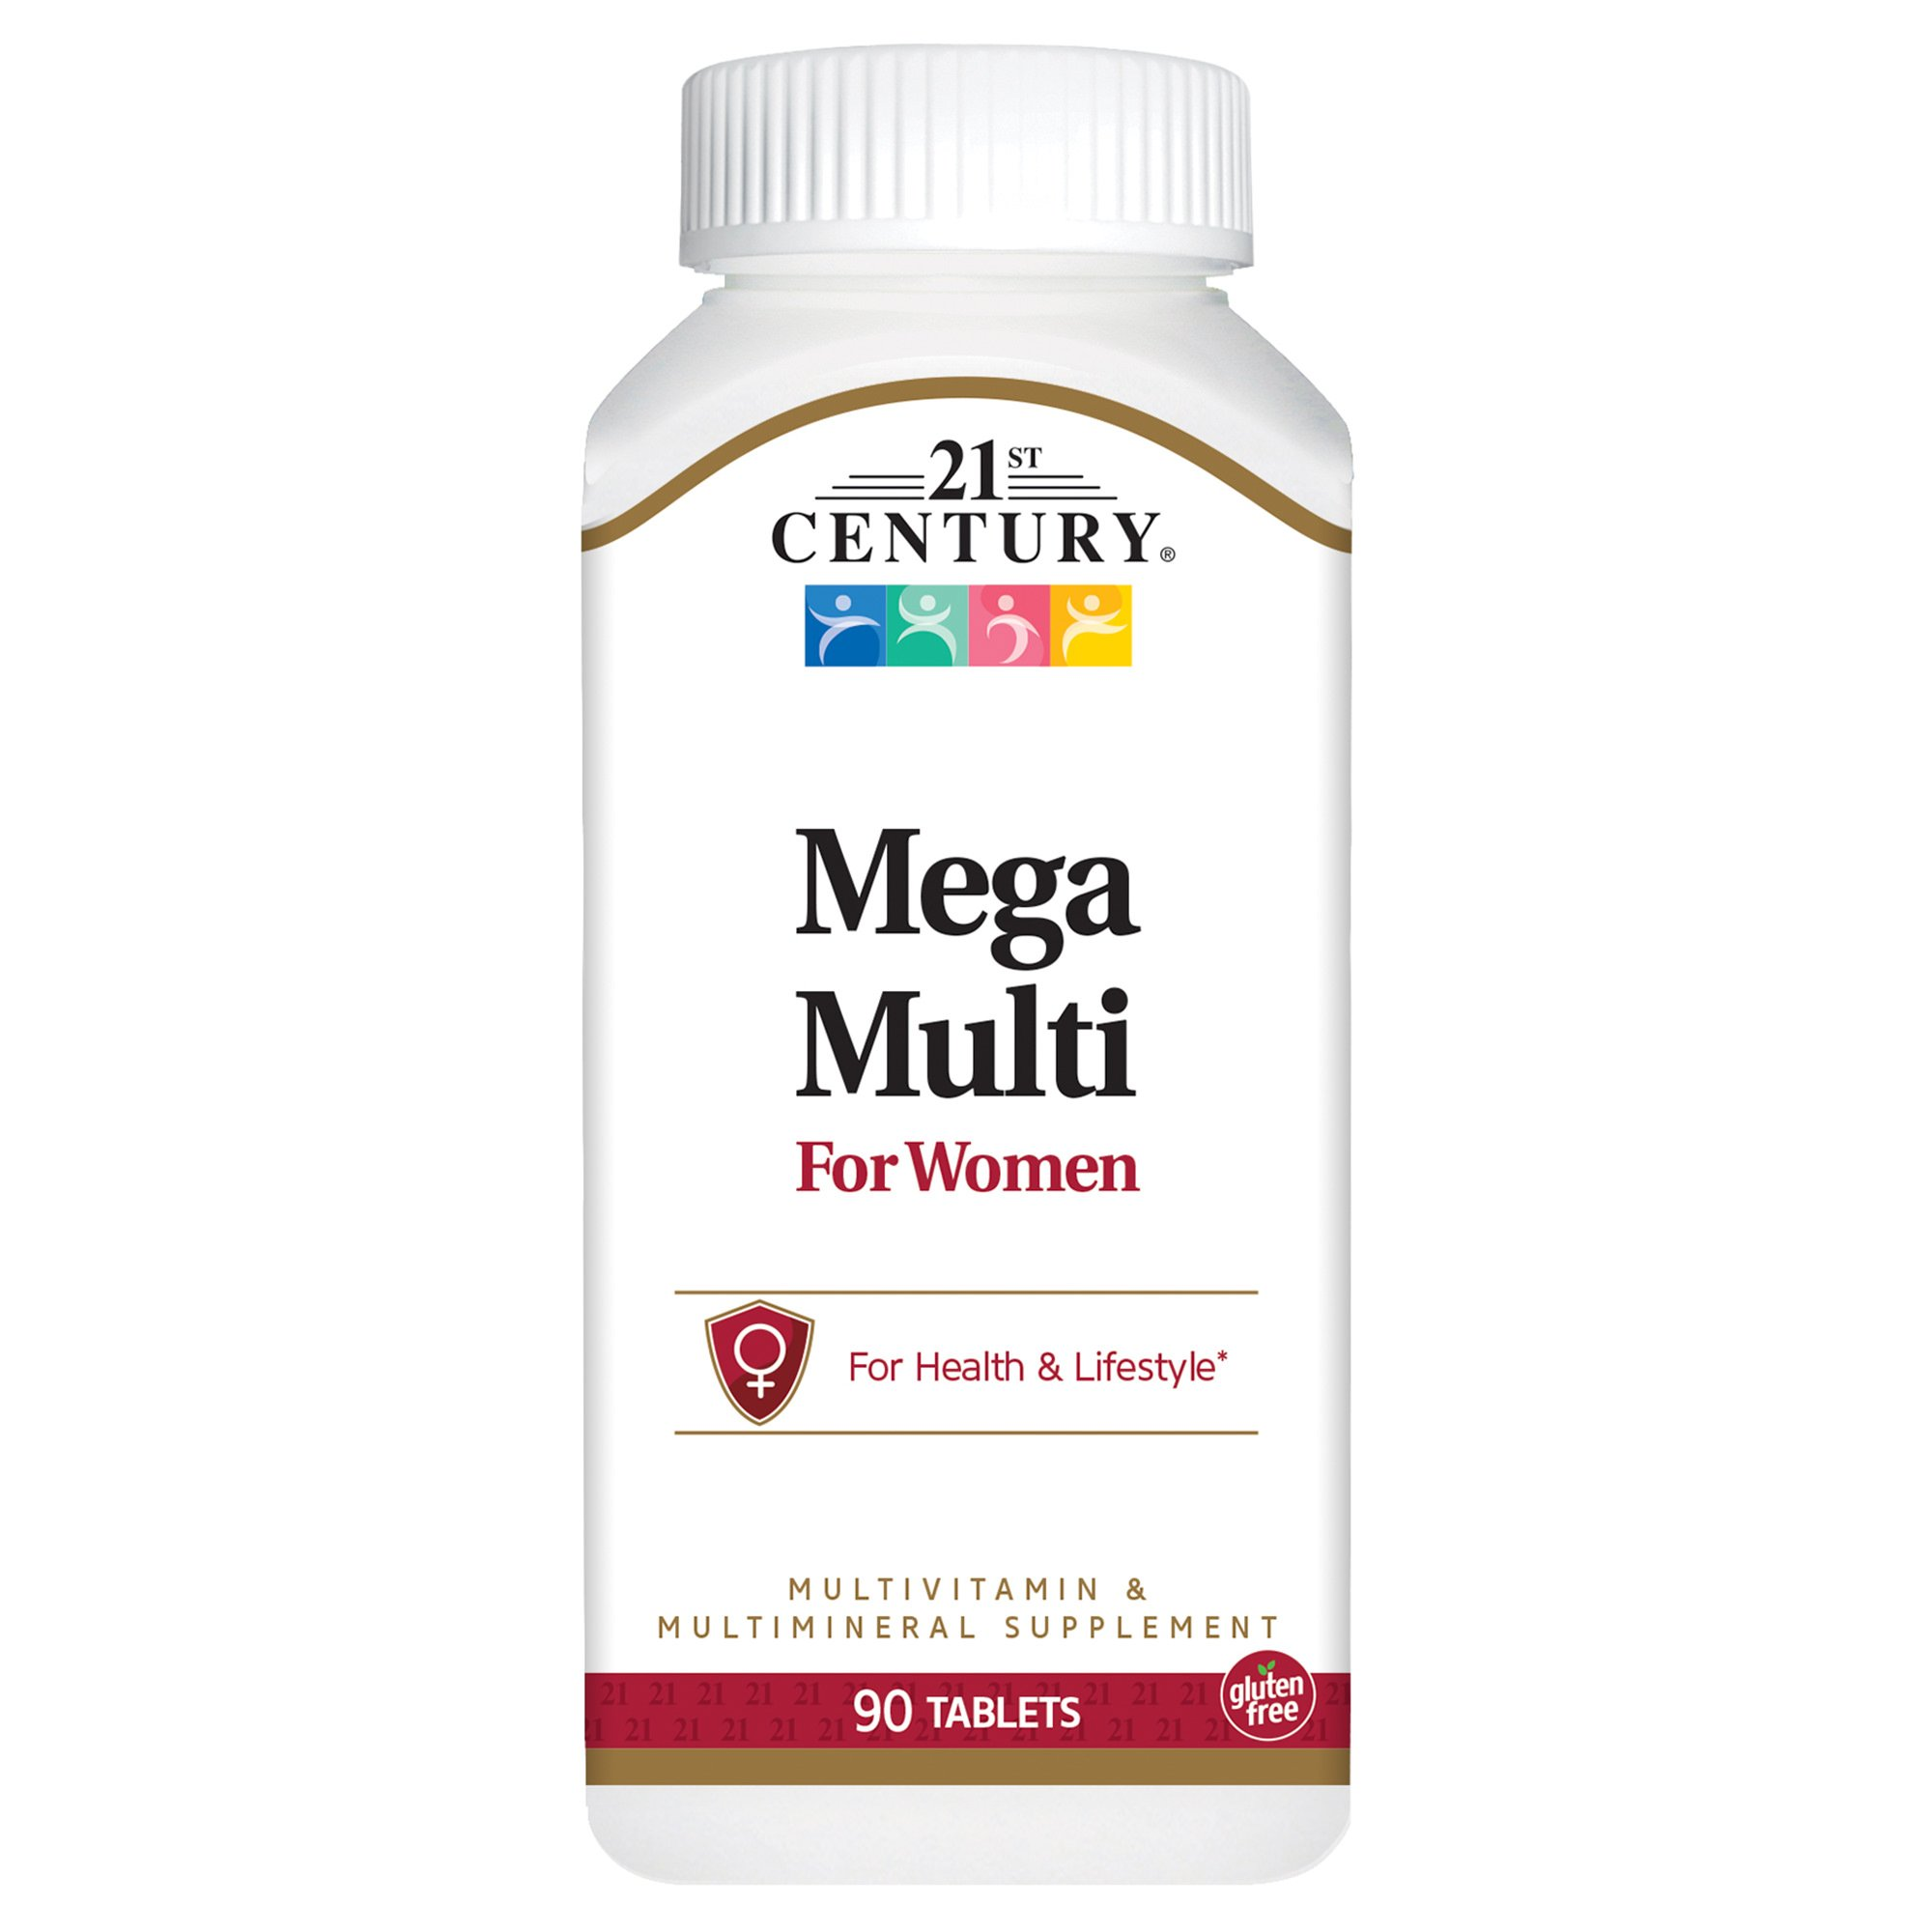 21st Century Mega Multi for Women Tablets, 90 Count